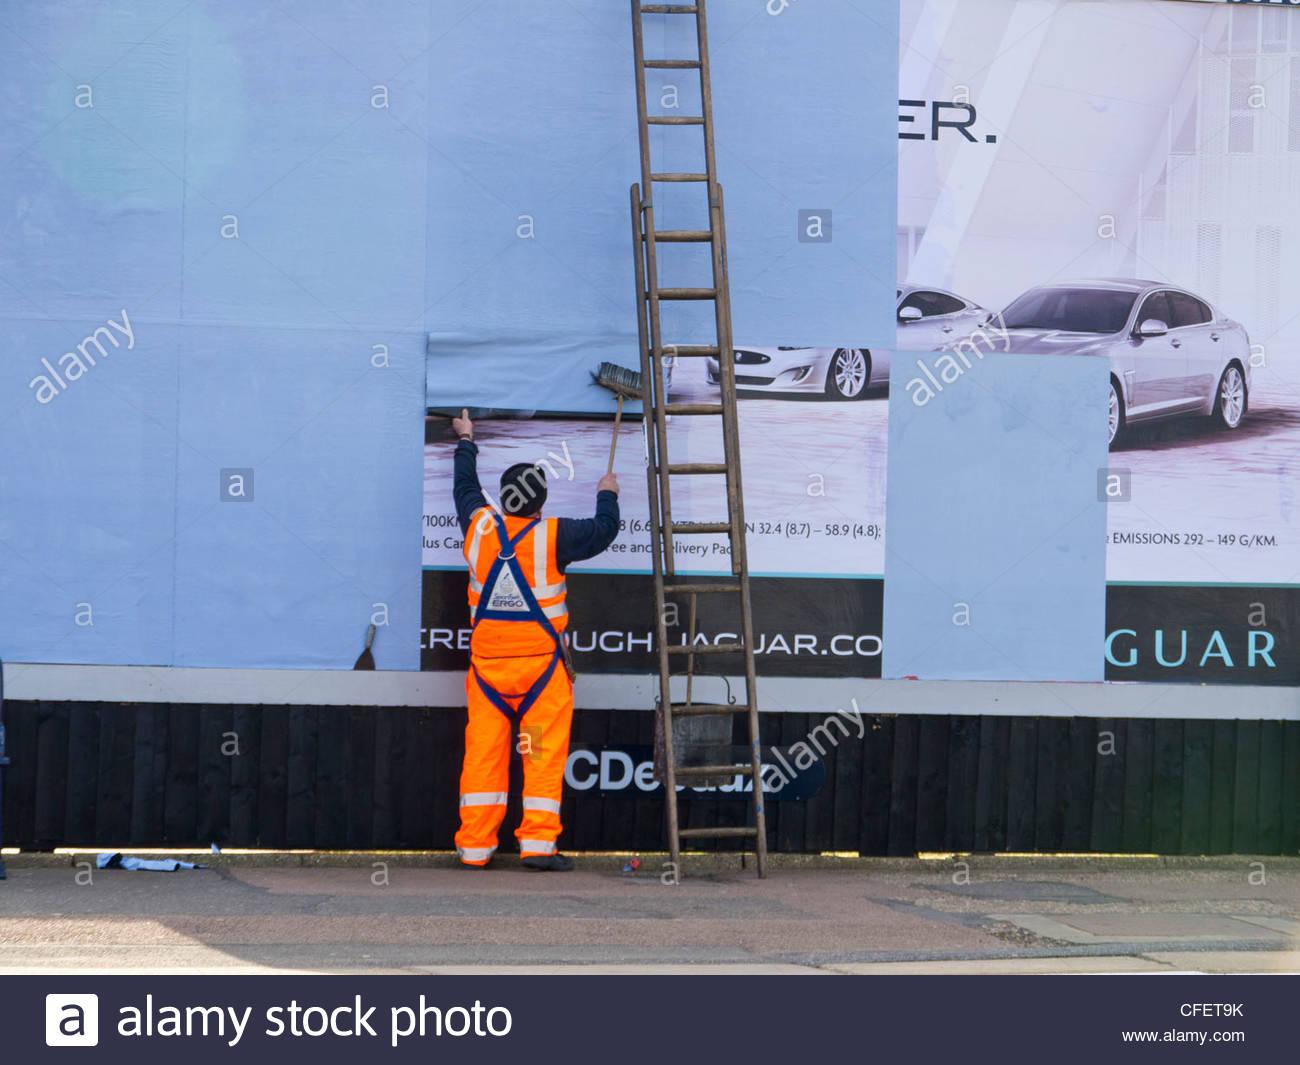 https://c8.alamy.com/comp/CFET9K/bill-poster-pasting-ad-on-ladder-england-uk-CFET9K.jpg